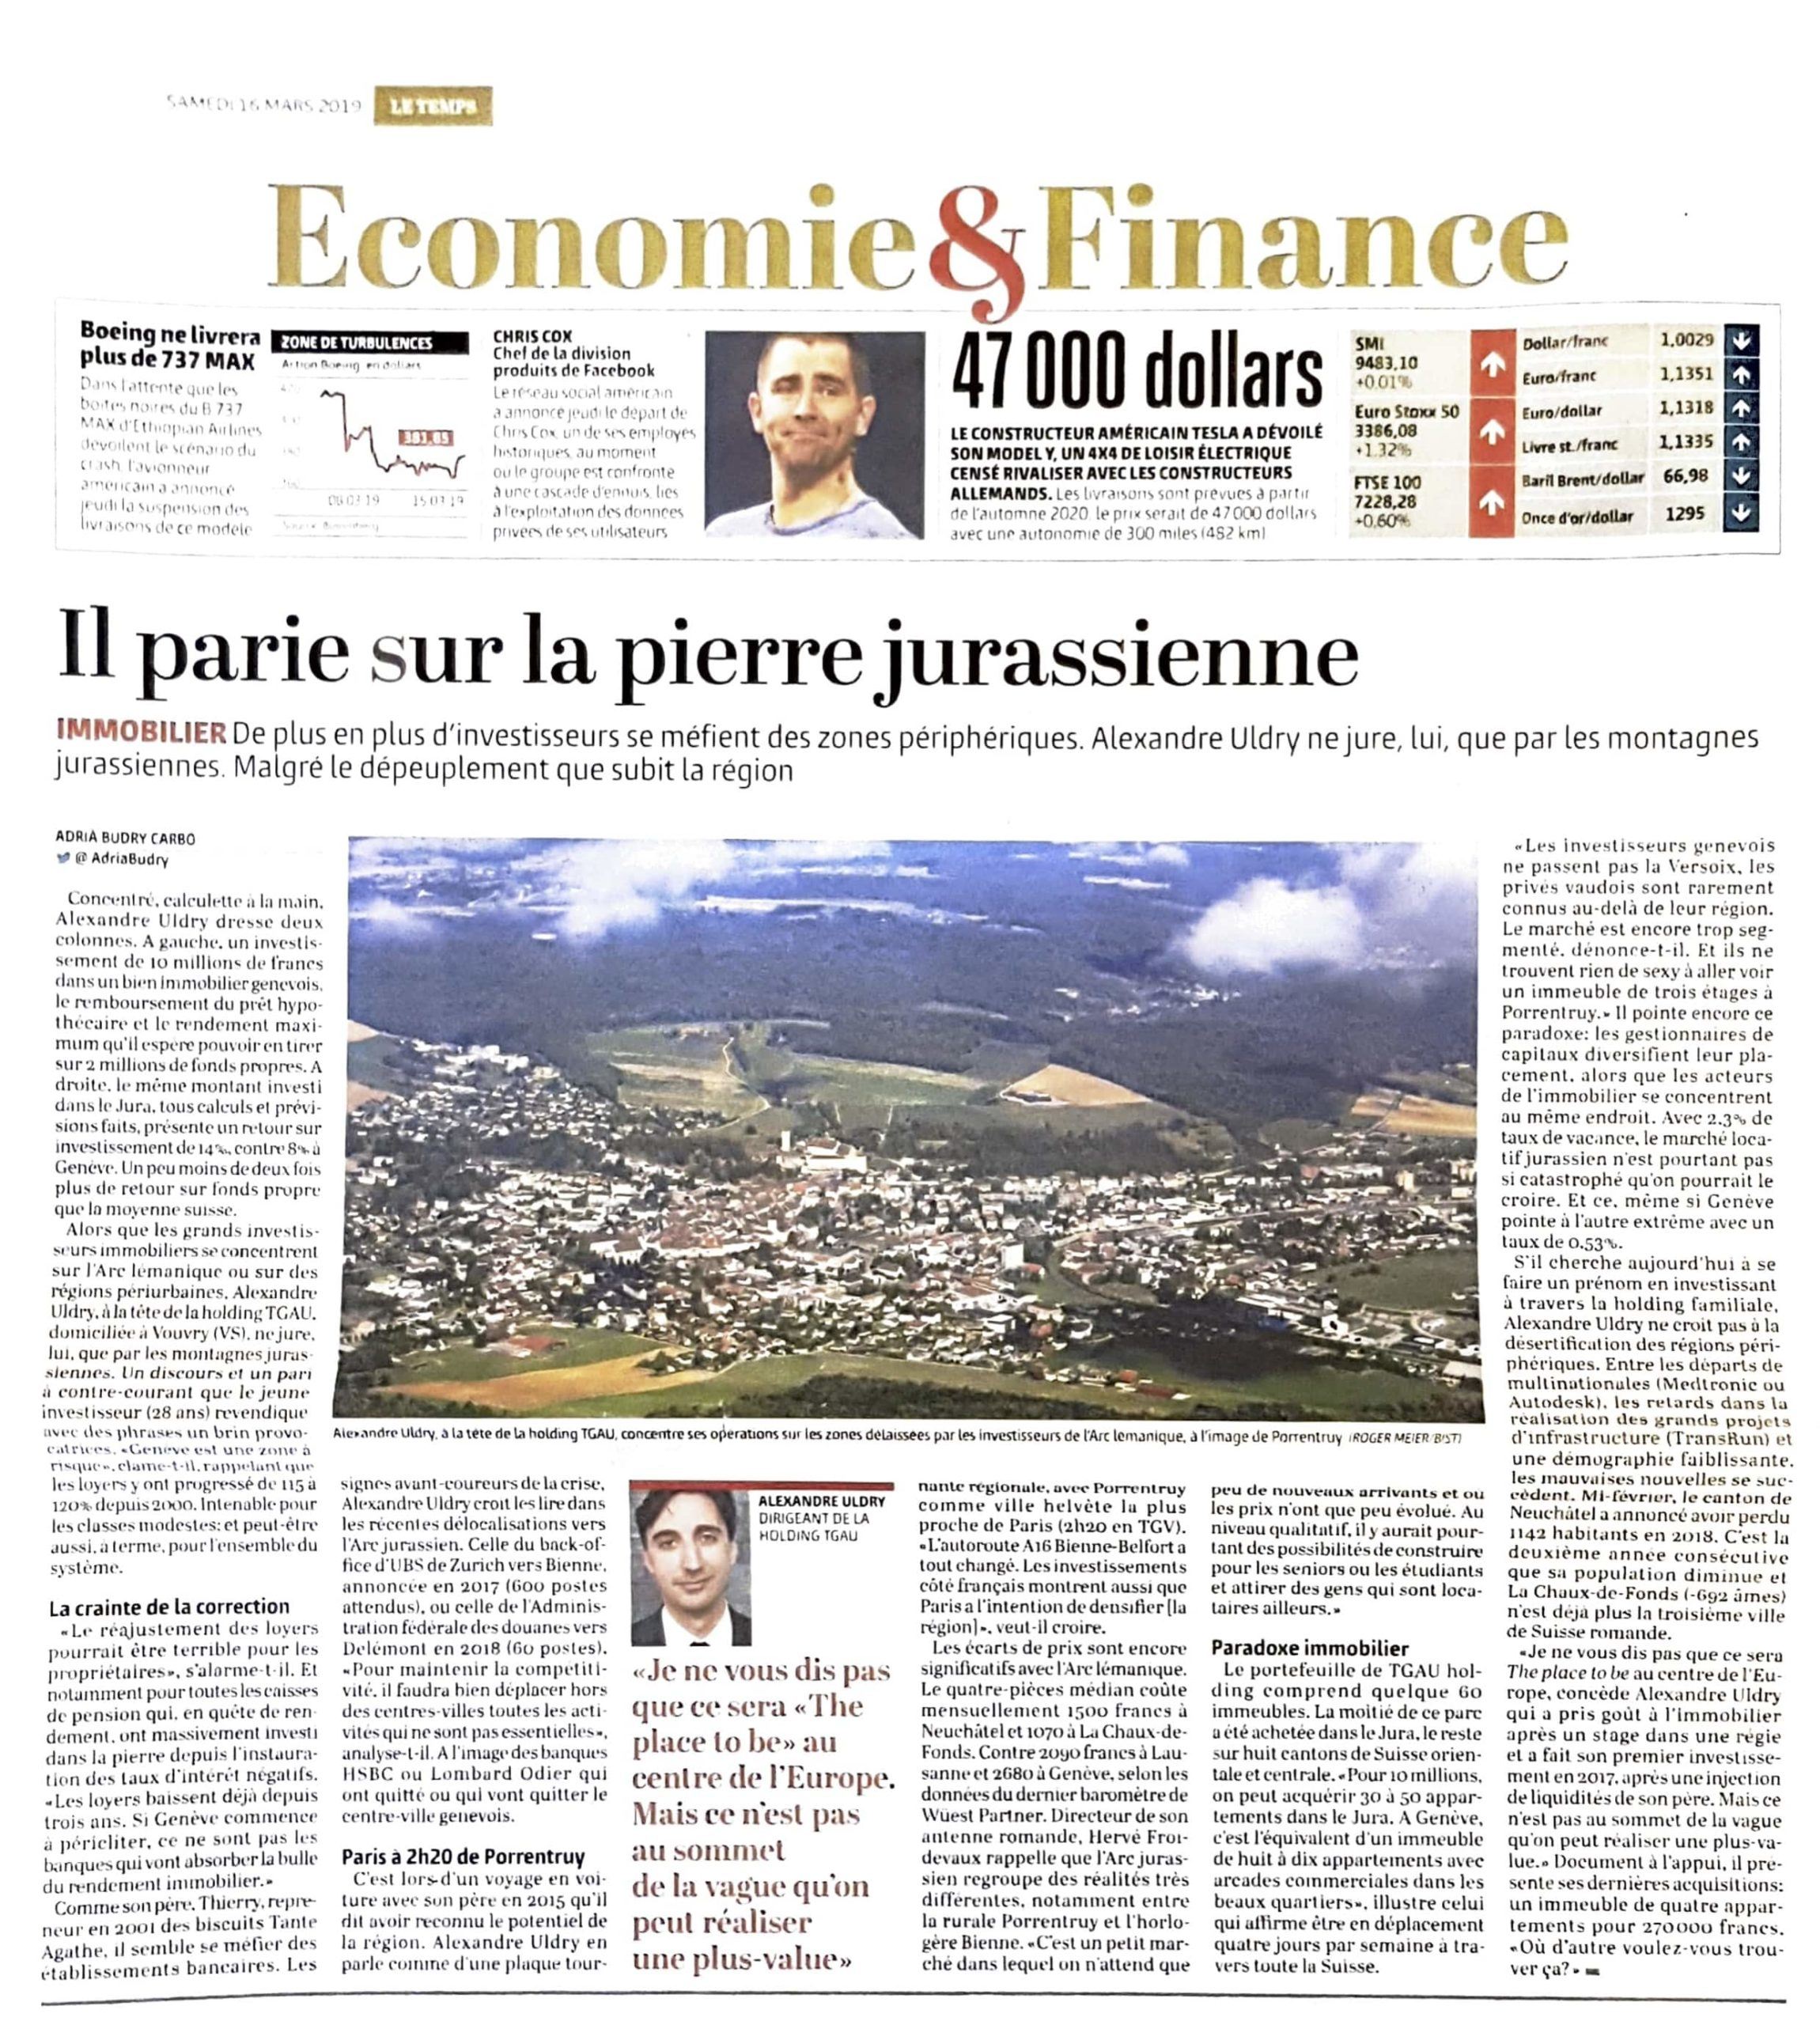 LVTIC-actualites-mars-2019-investisseurs-se-mefient-des-zones-peripheriques